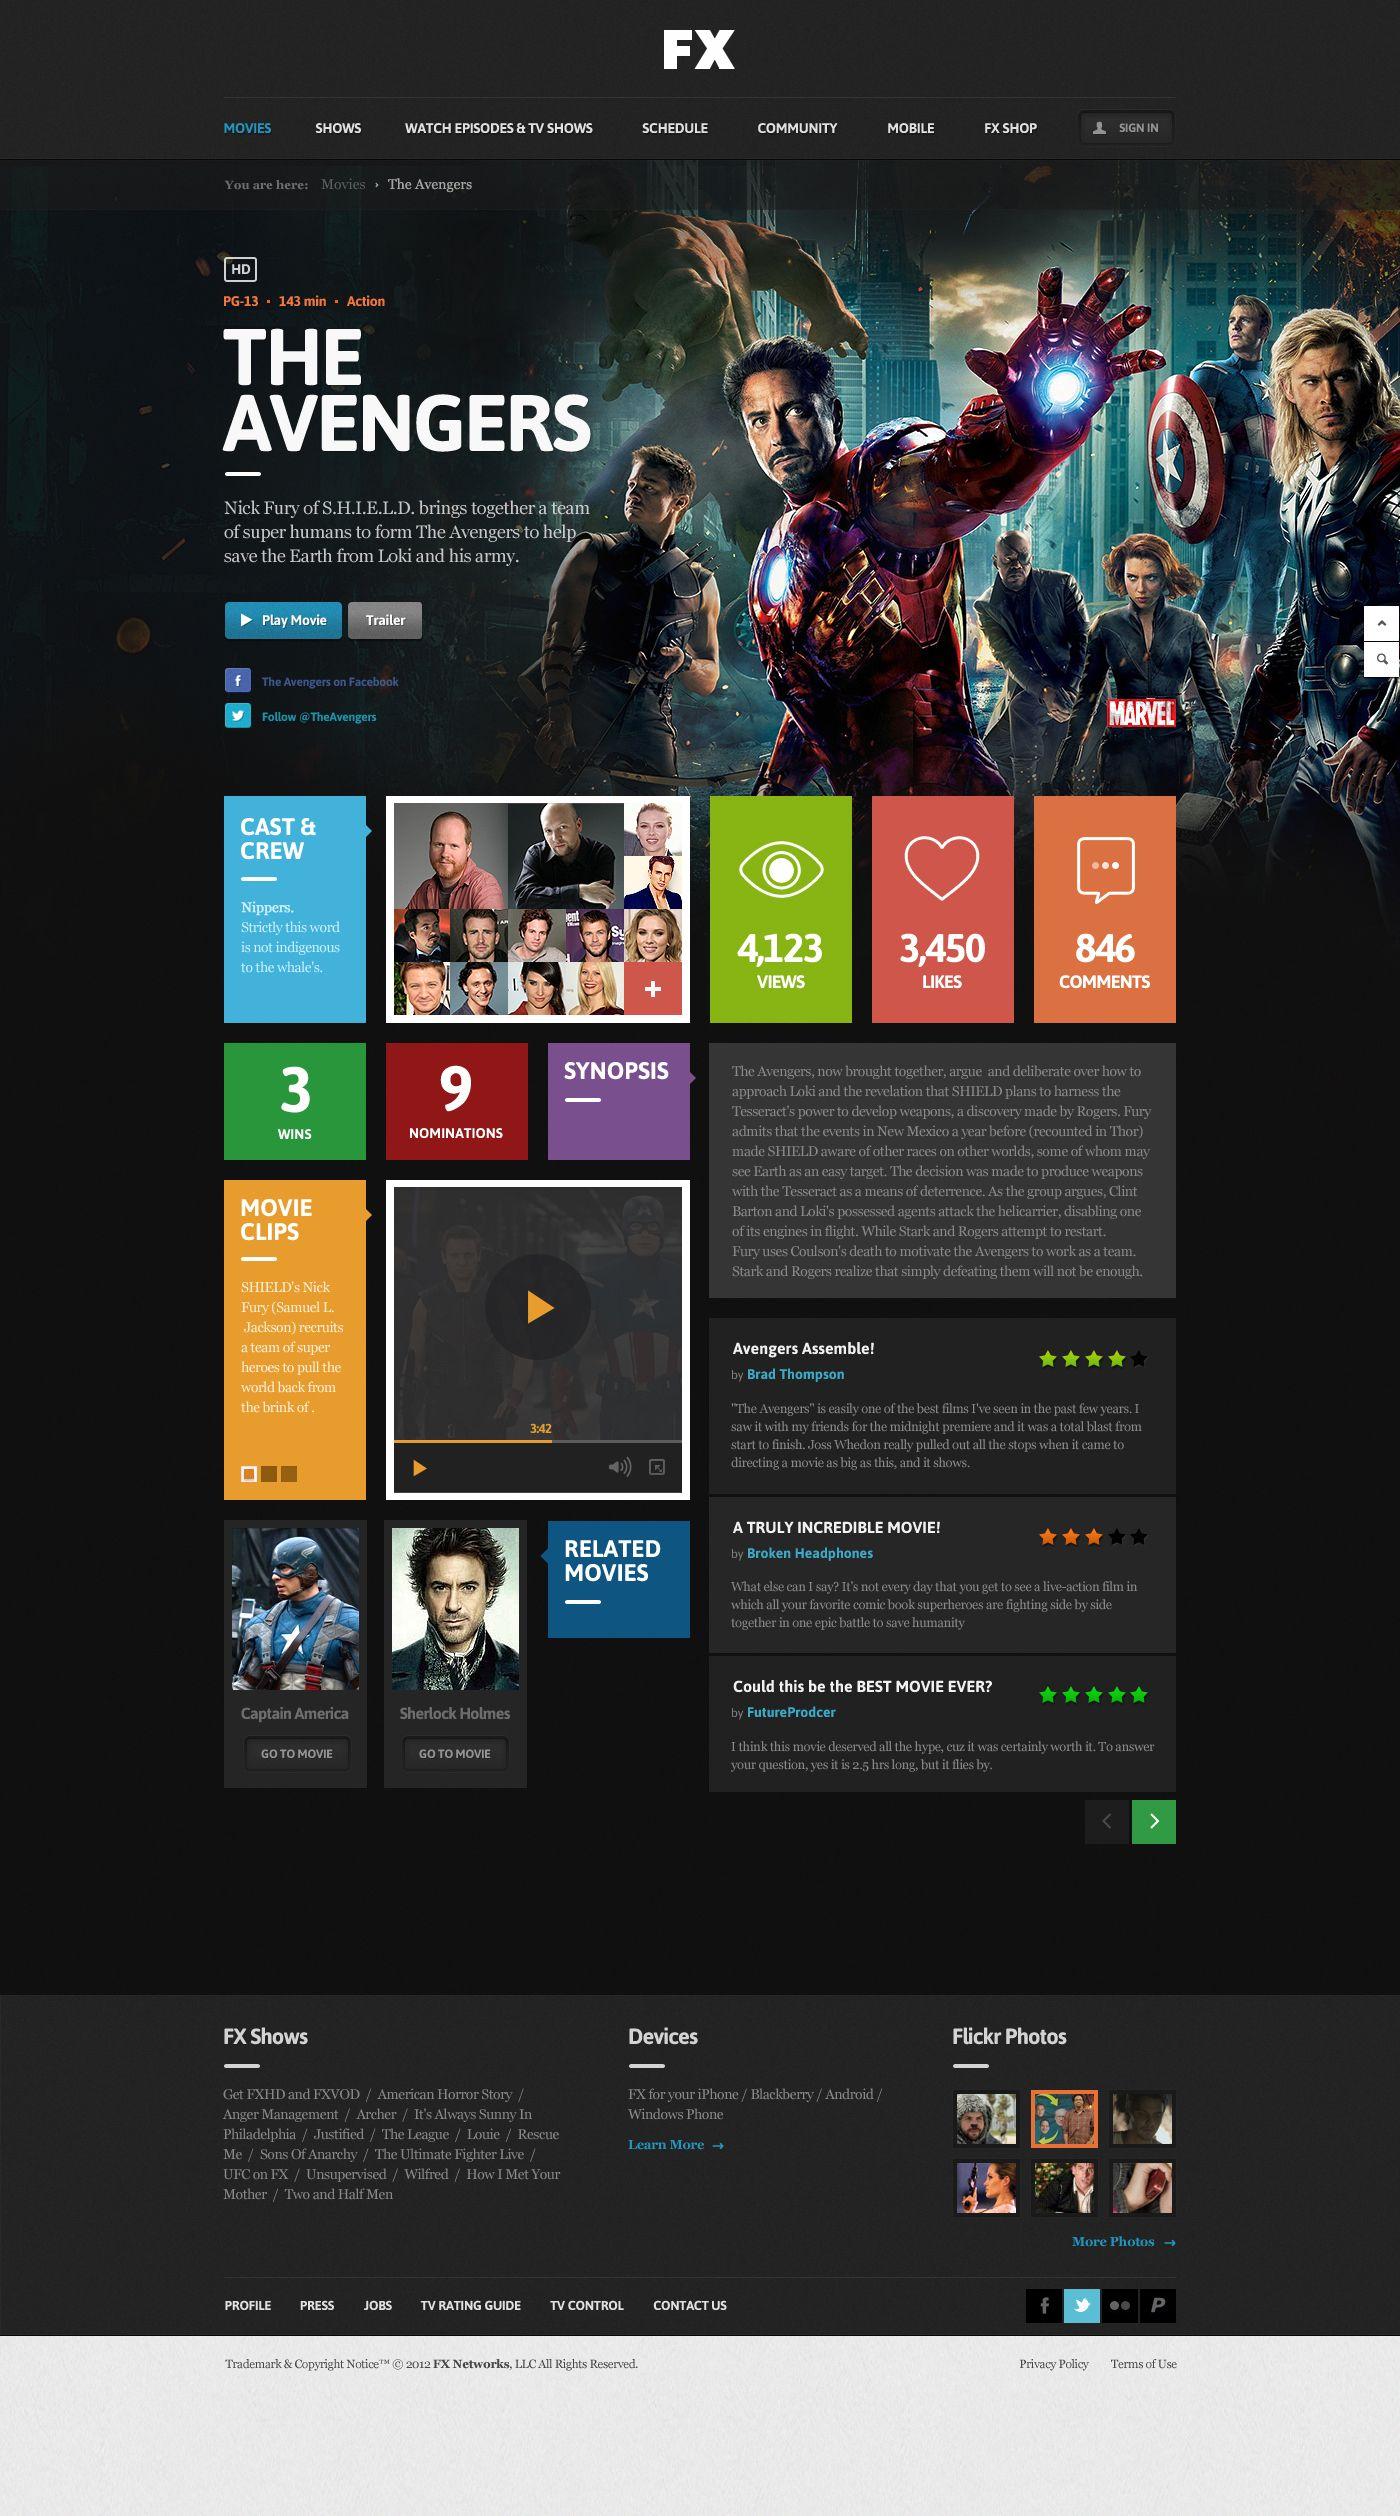 15 Beautiful Examples Of Web Design Inspiration Part 3 Web Design Inspiration Web Design Web Layout Design